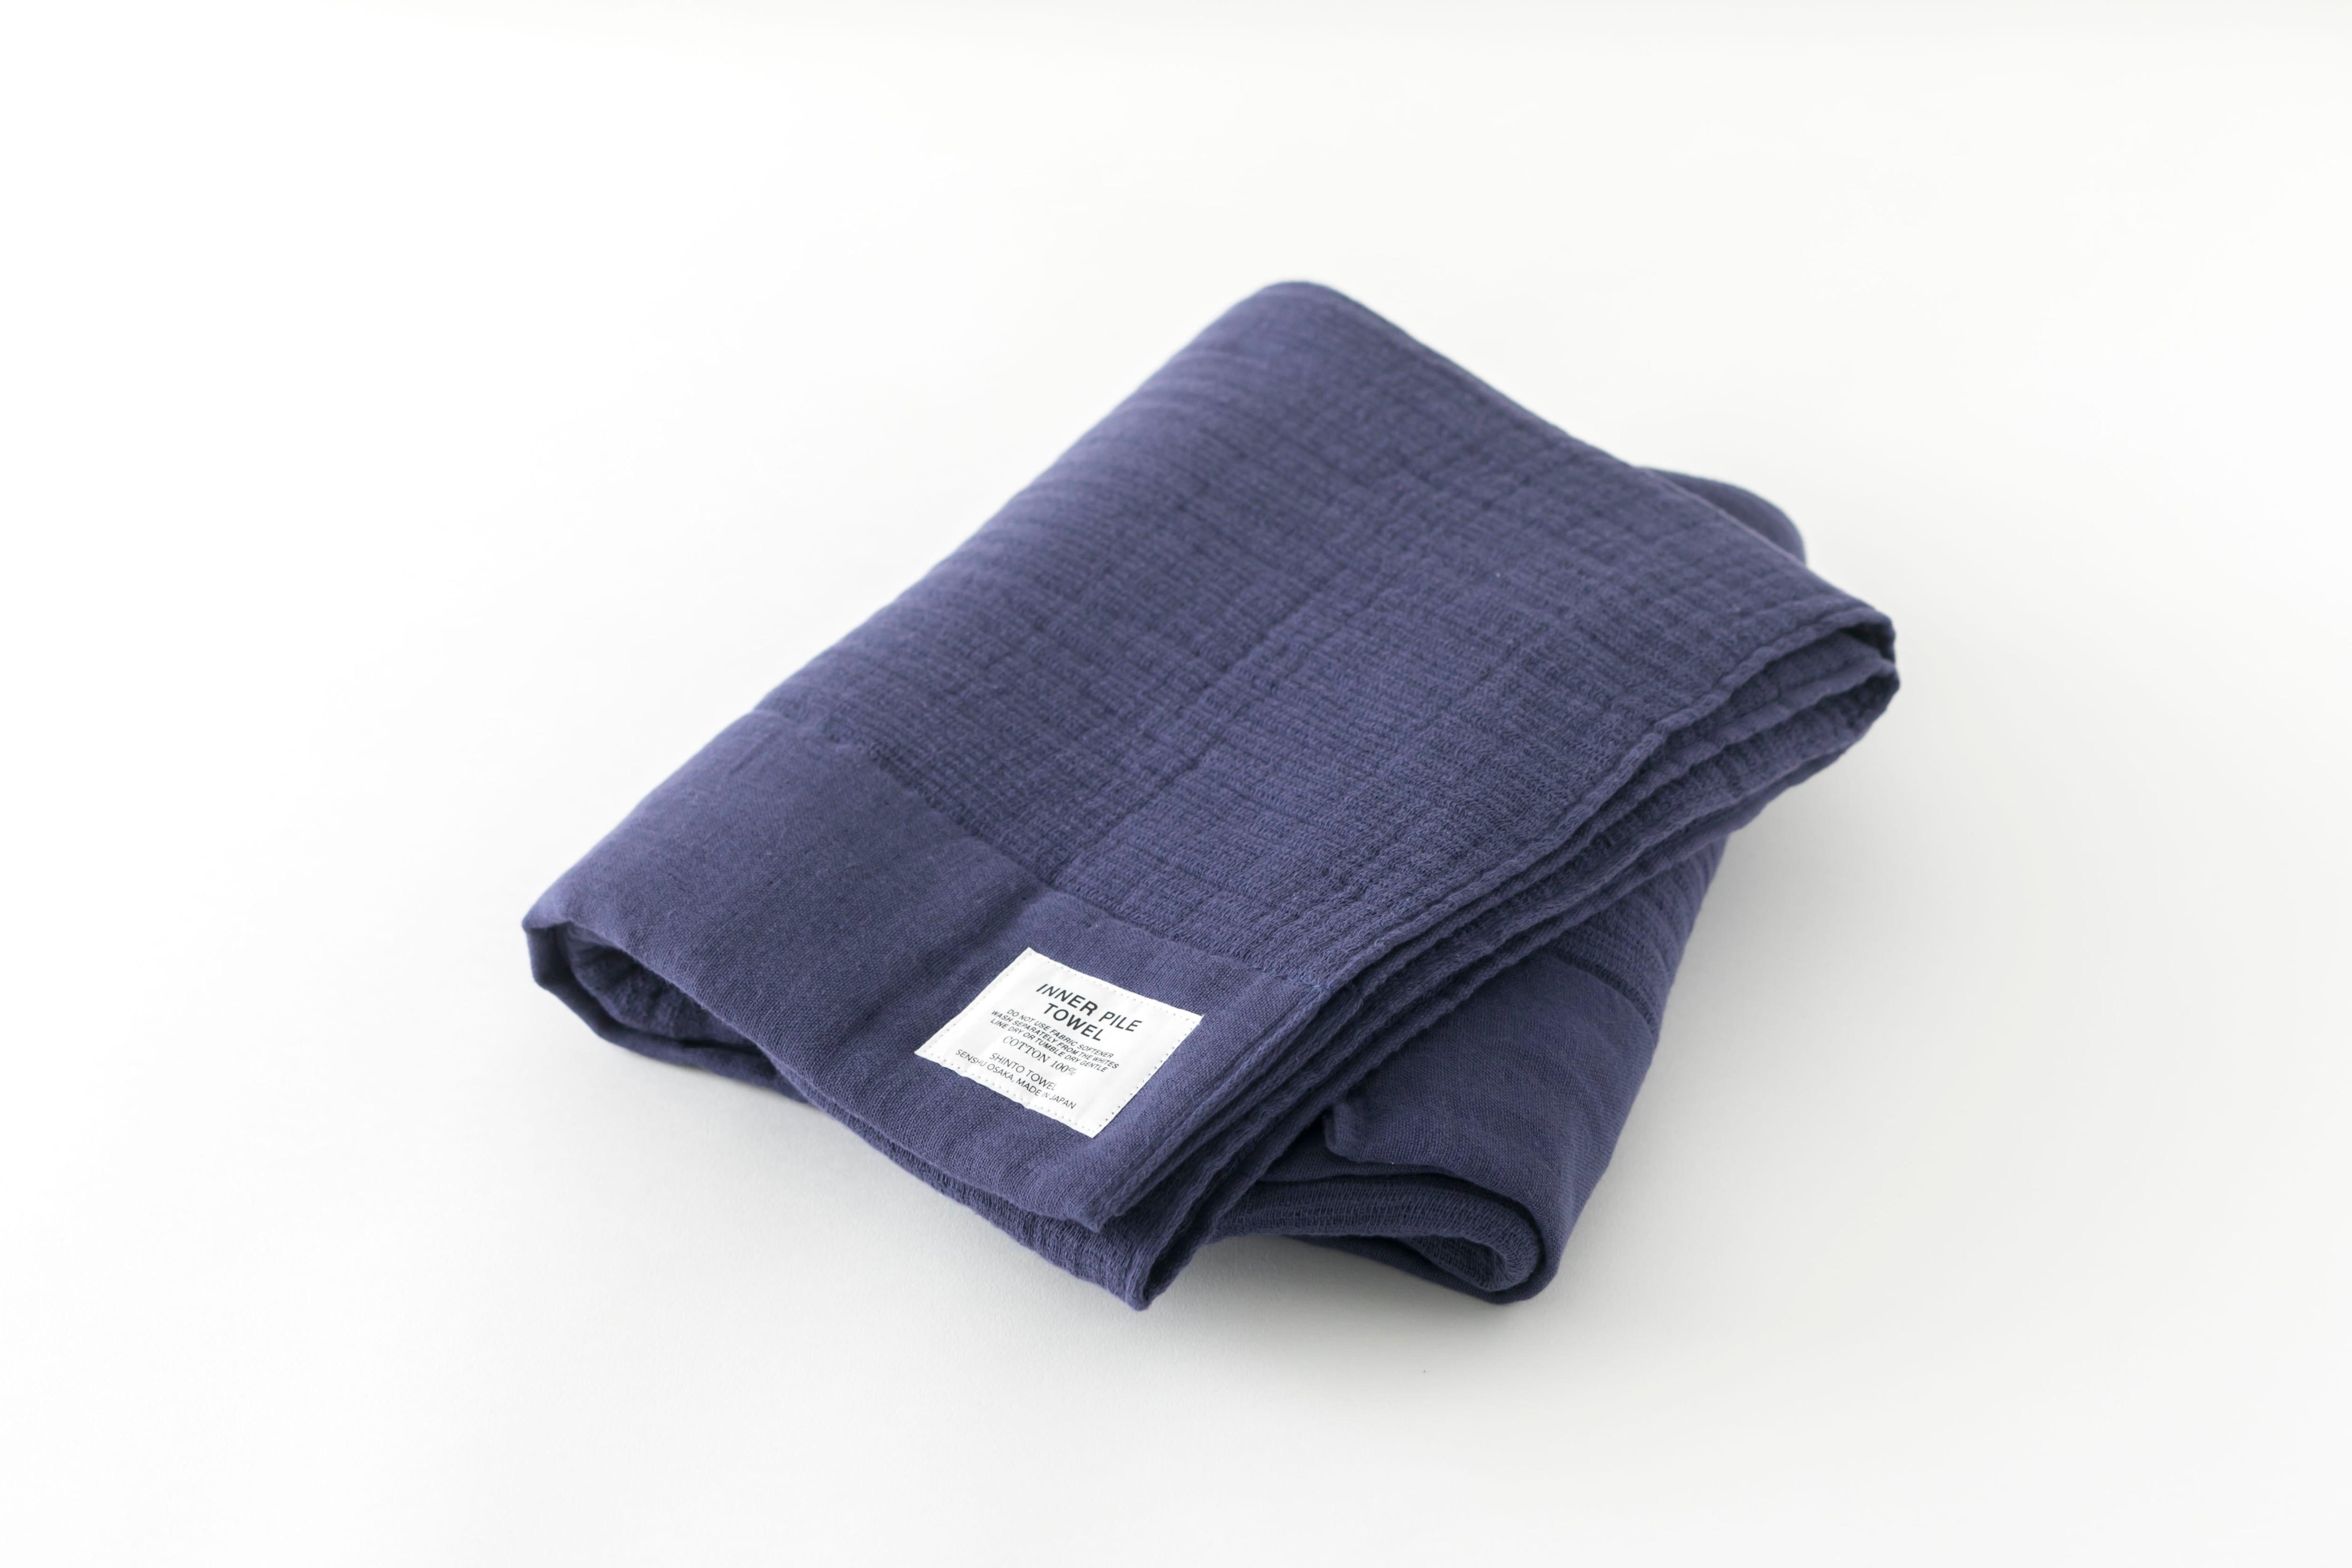 INNER PILE TOWEL : BATH TOWEL (Navy) / SHINTO TOWEL